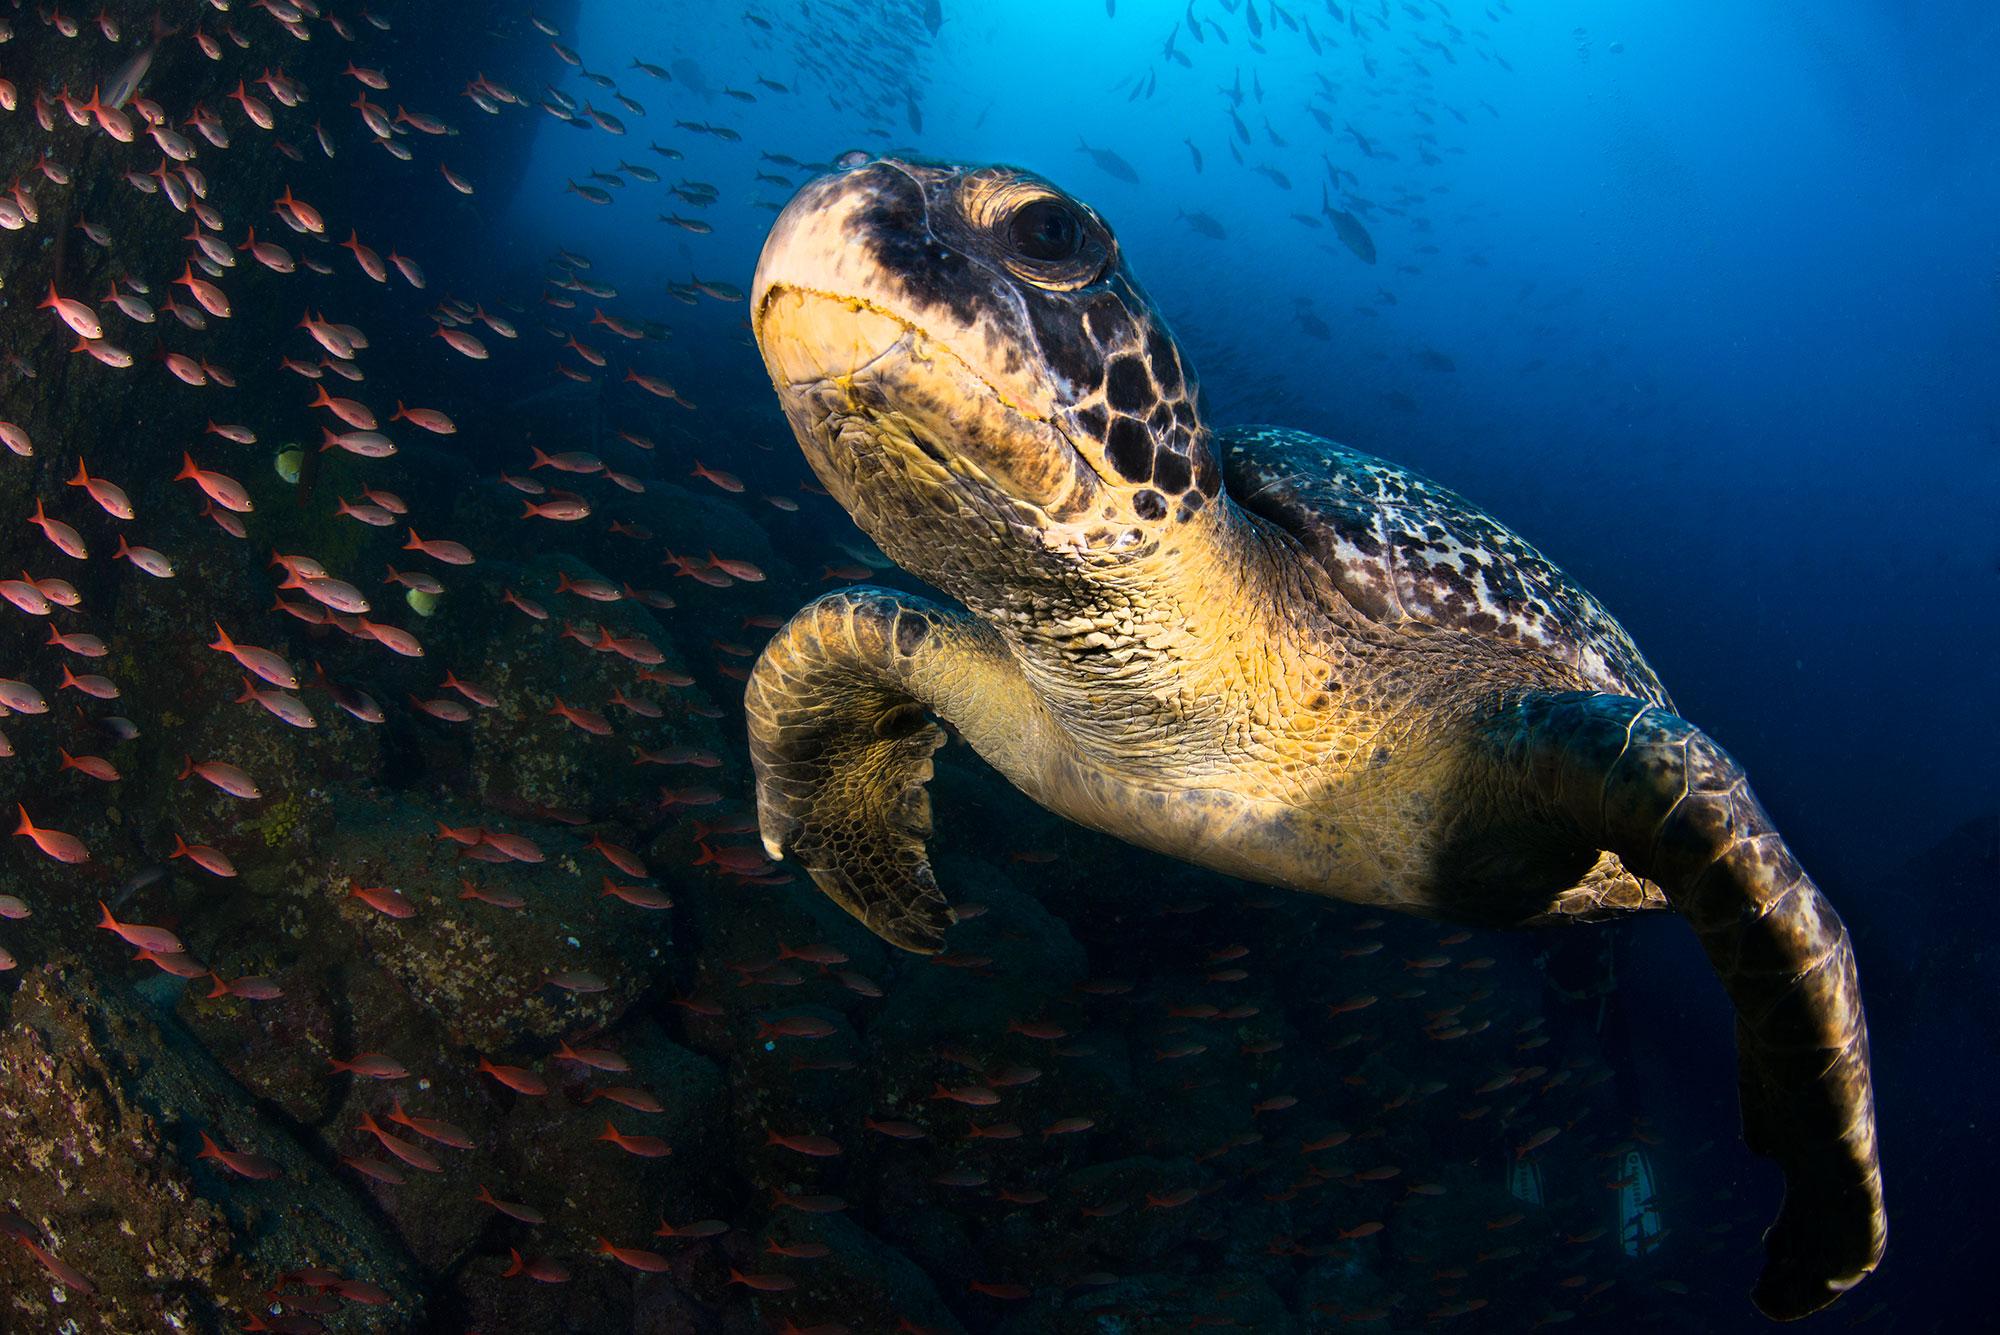 Galapagos Sea Turtle, Meeresschildkröte